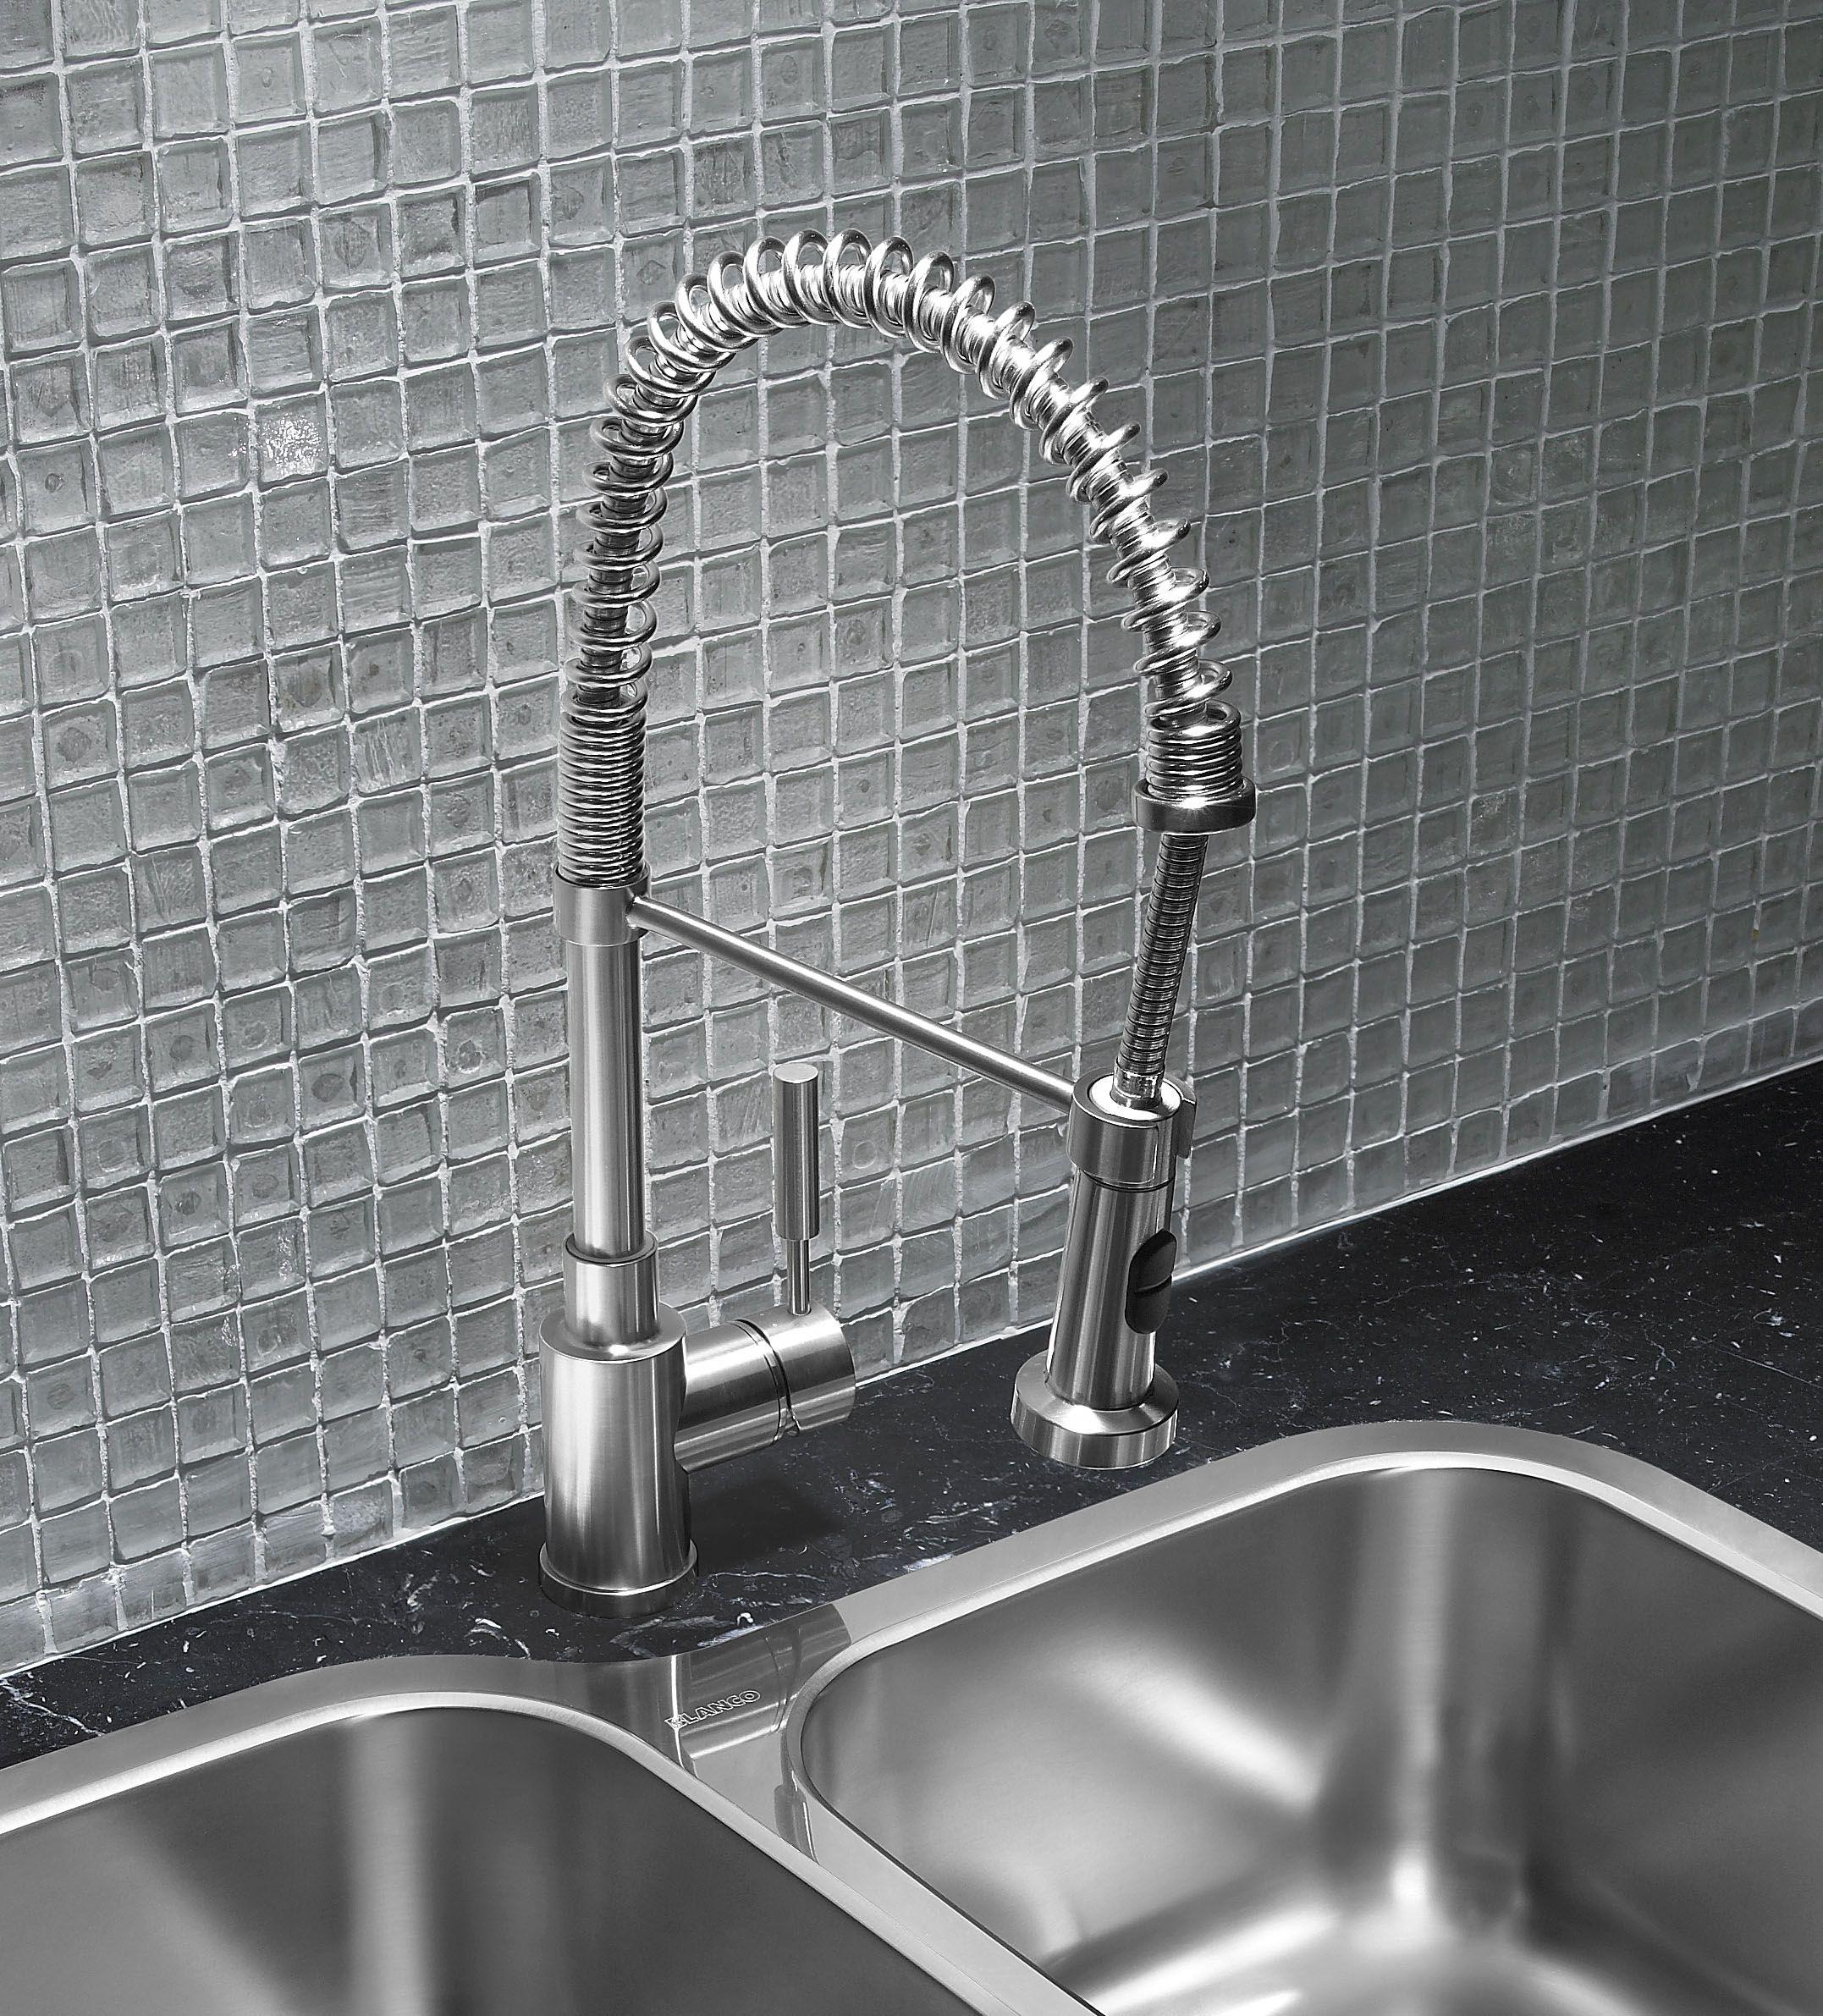 BLANCO DIVA faucet in chrome | BLANCO Faucets | Pinterest | Faucet ...